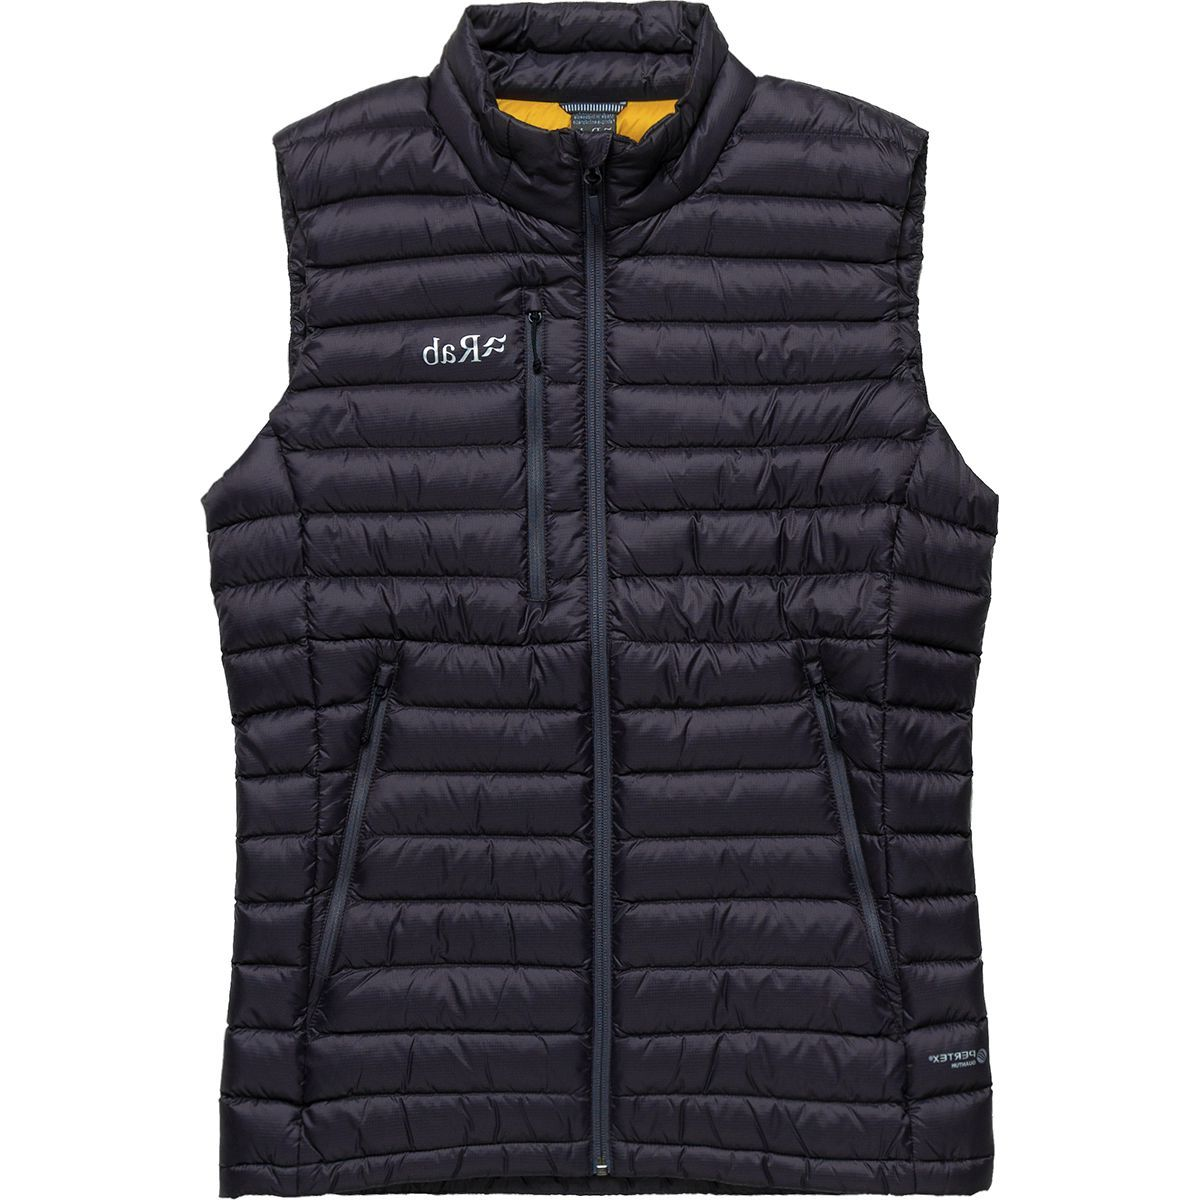 Rab Microlight Vest - Men's